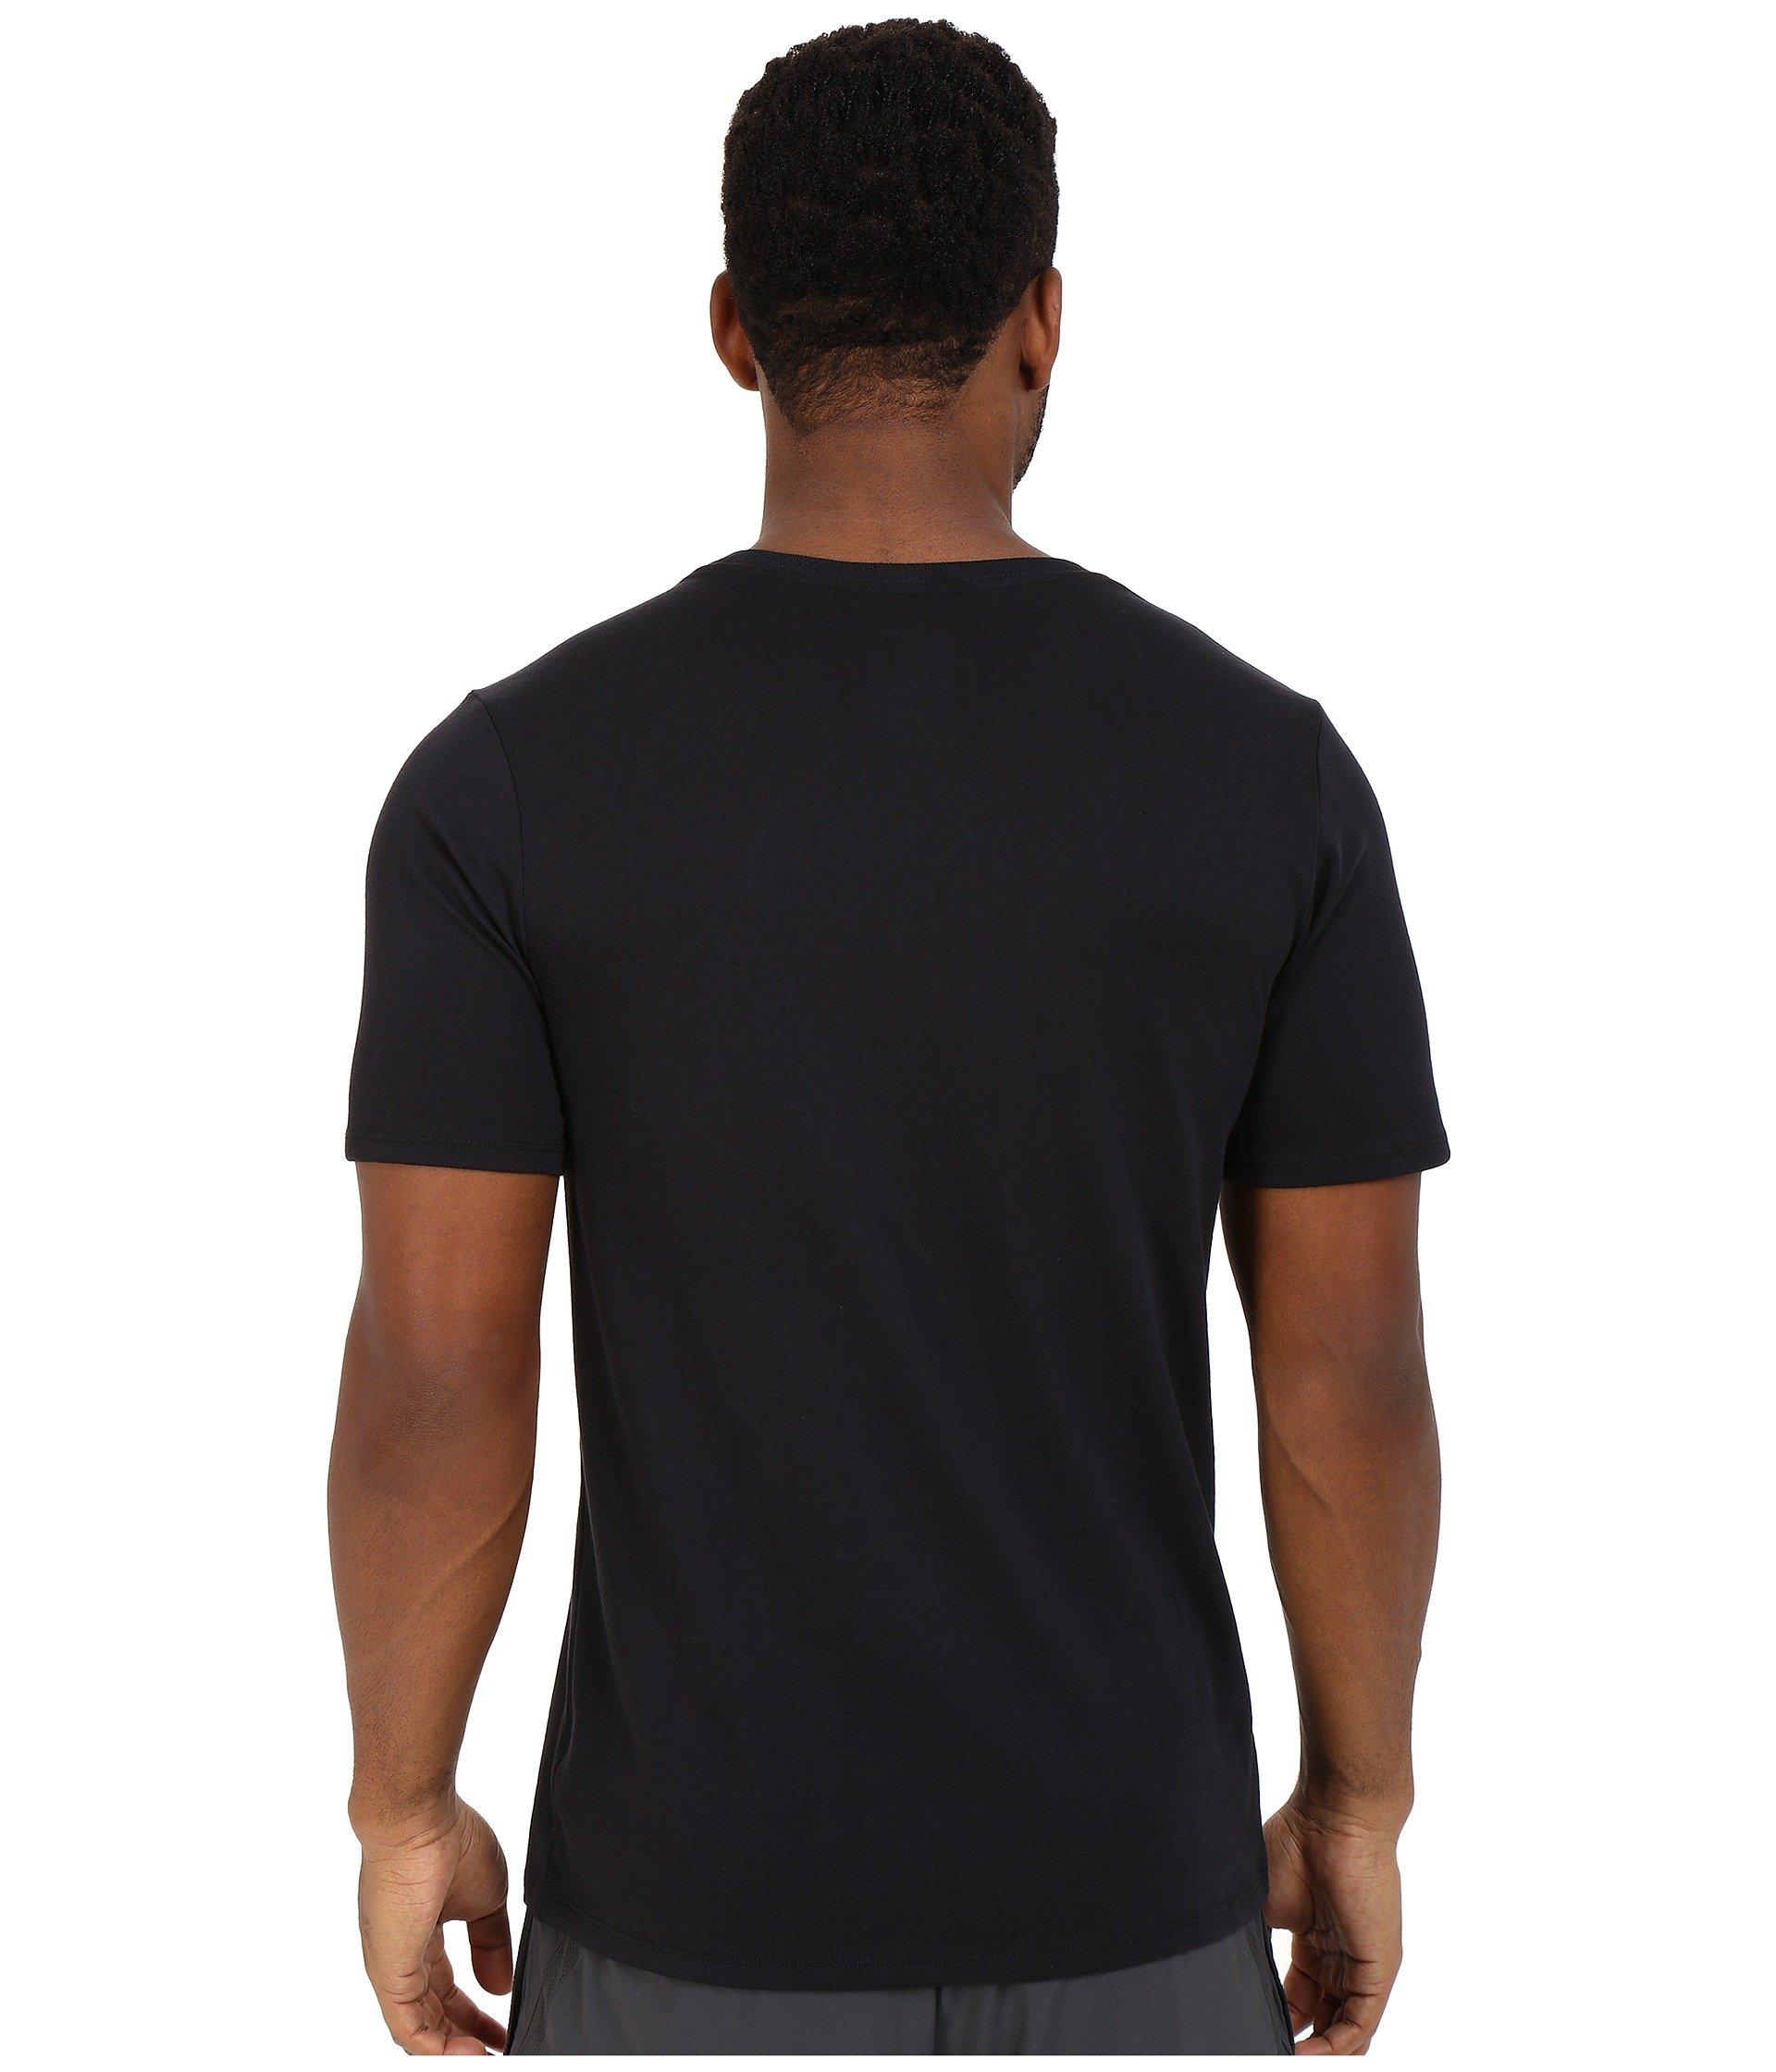 NIKE Men's Dri-FIT Cotton 2.0 Tee, Black/Black/White, Small by Nike (Image #4)